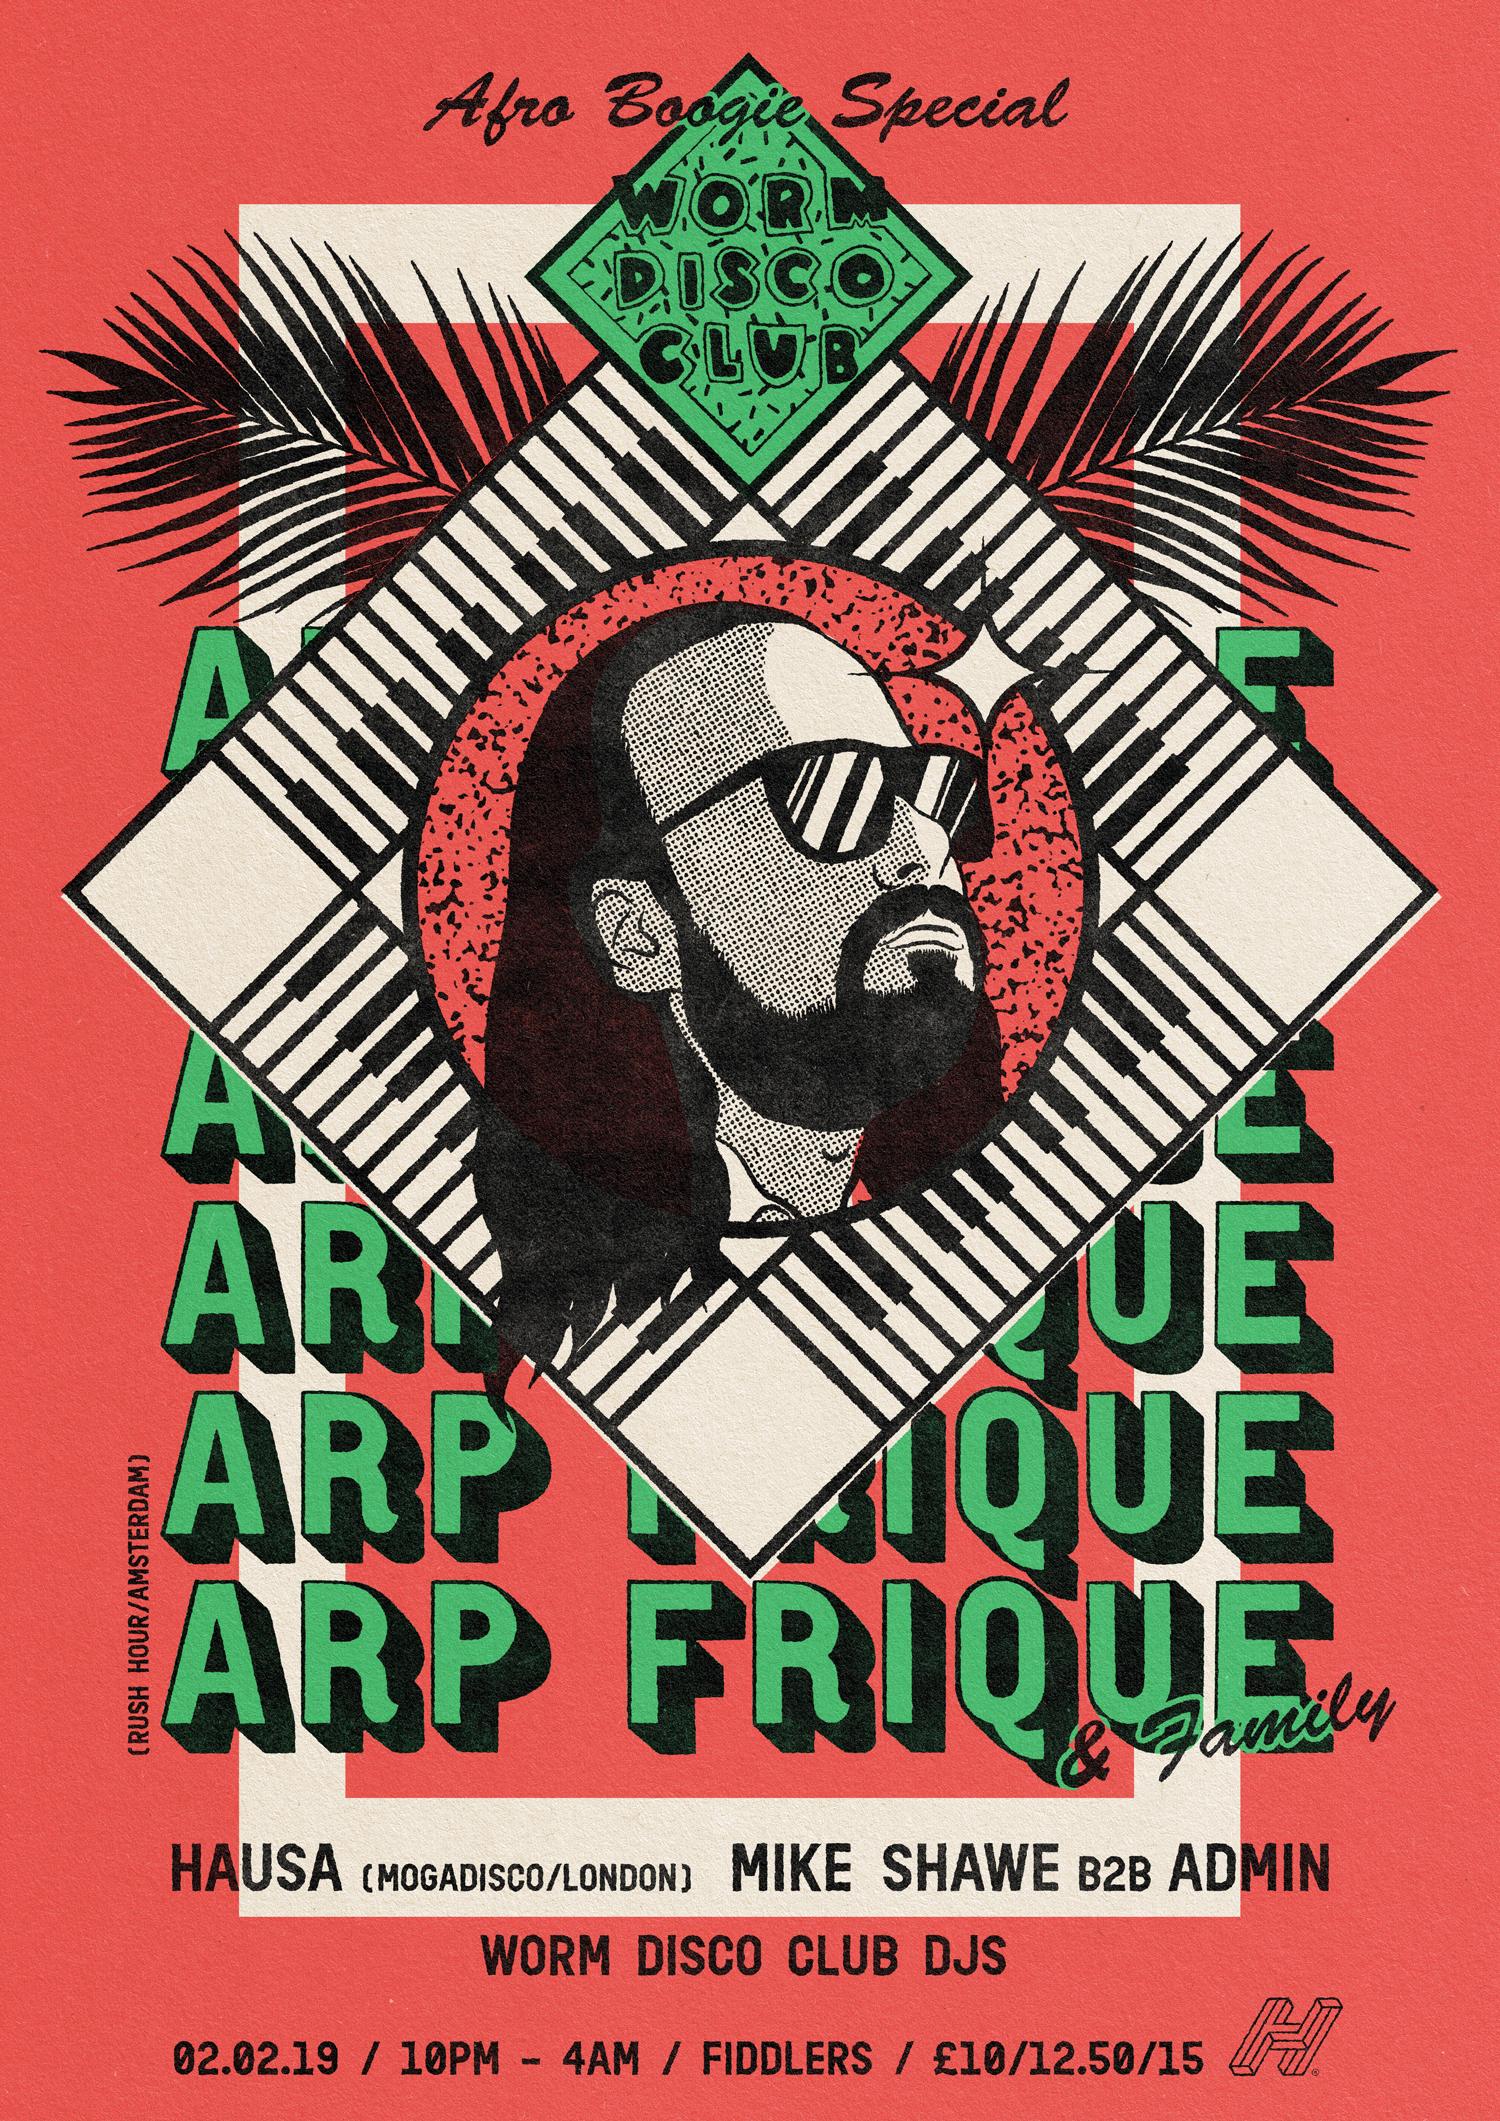 ARP-FRIQUE.jpg